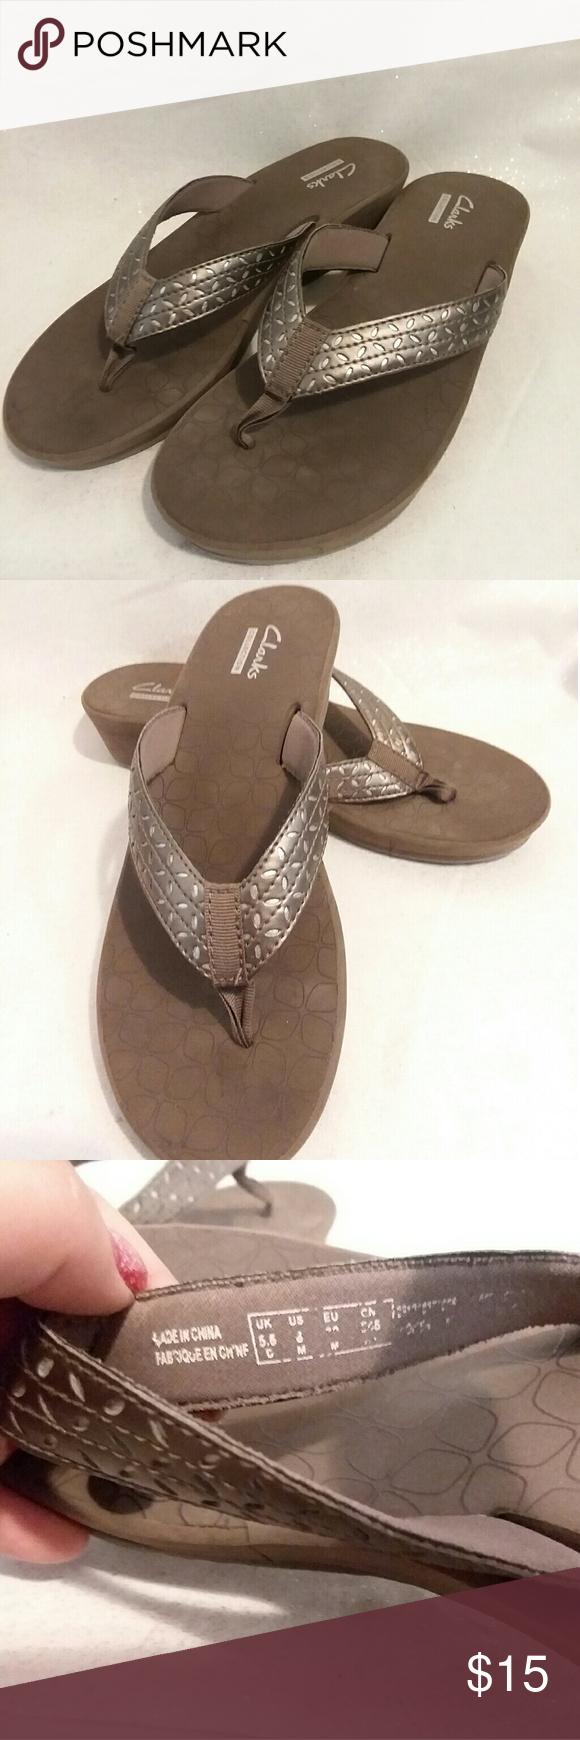 b0b35d91e038 Clarks Liya Gaze Womens Sandals Size 8 Pre-Owned in 2018